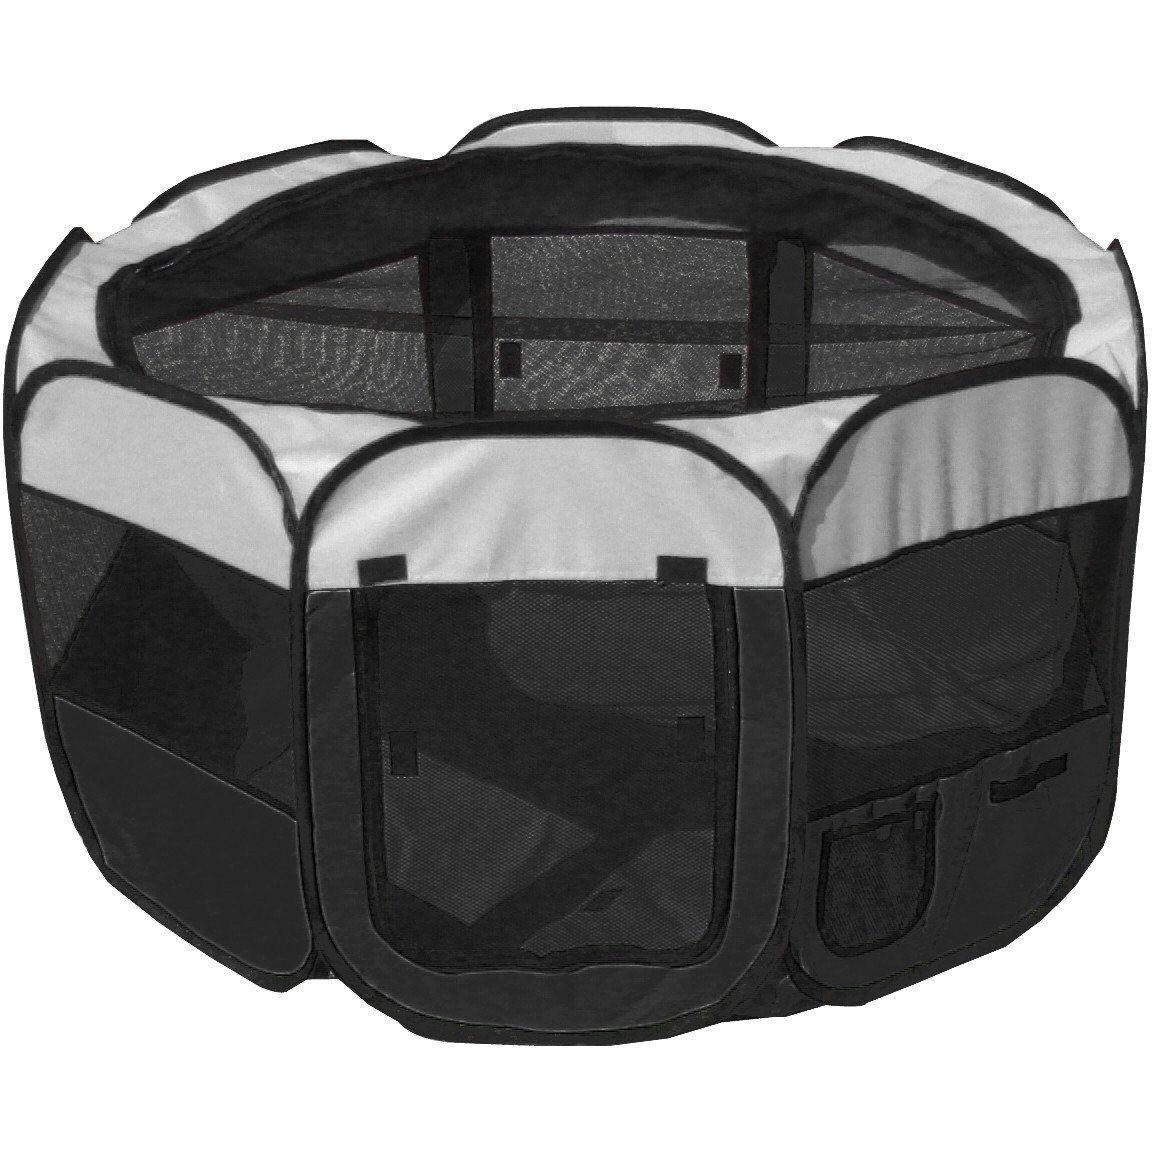 AllTerrain' Lightweight Easy Folding WireFramed Collapsible Travel Pet Playpen